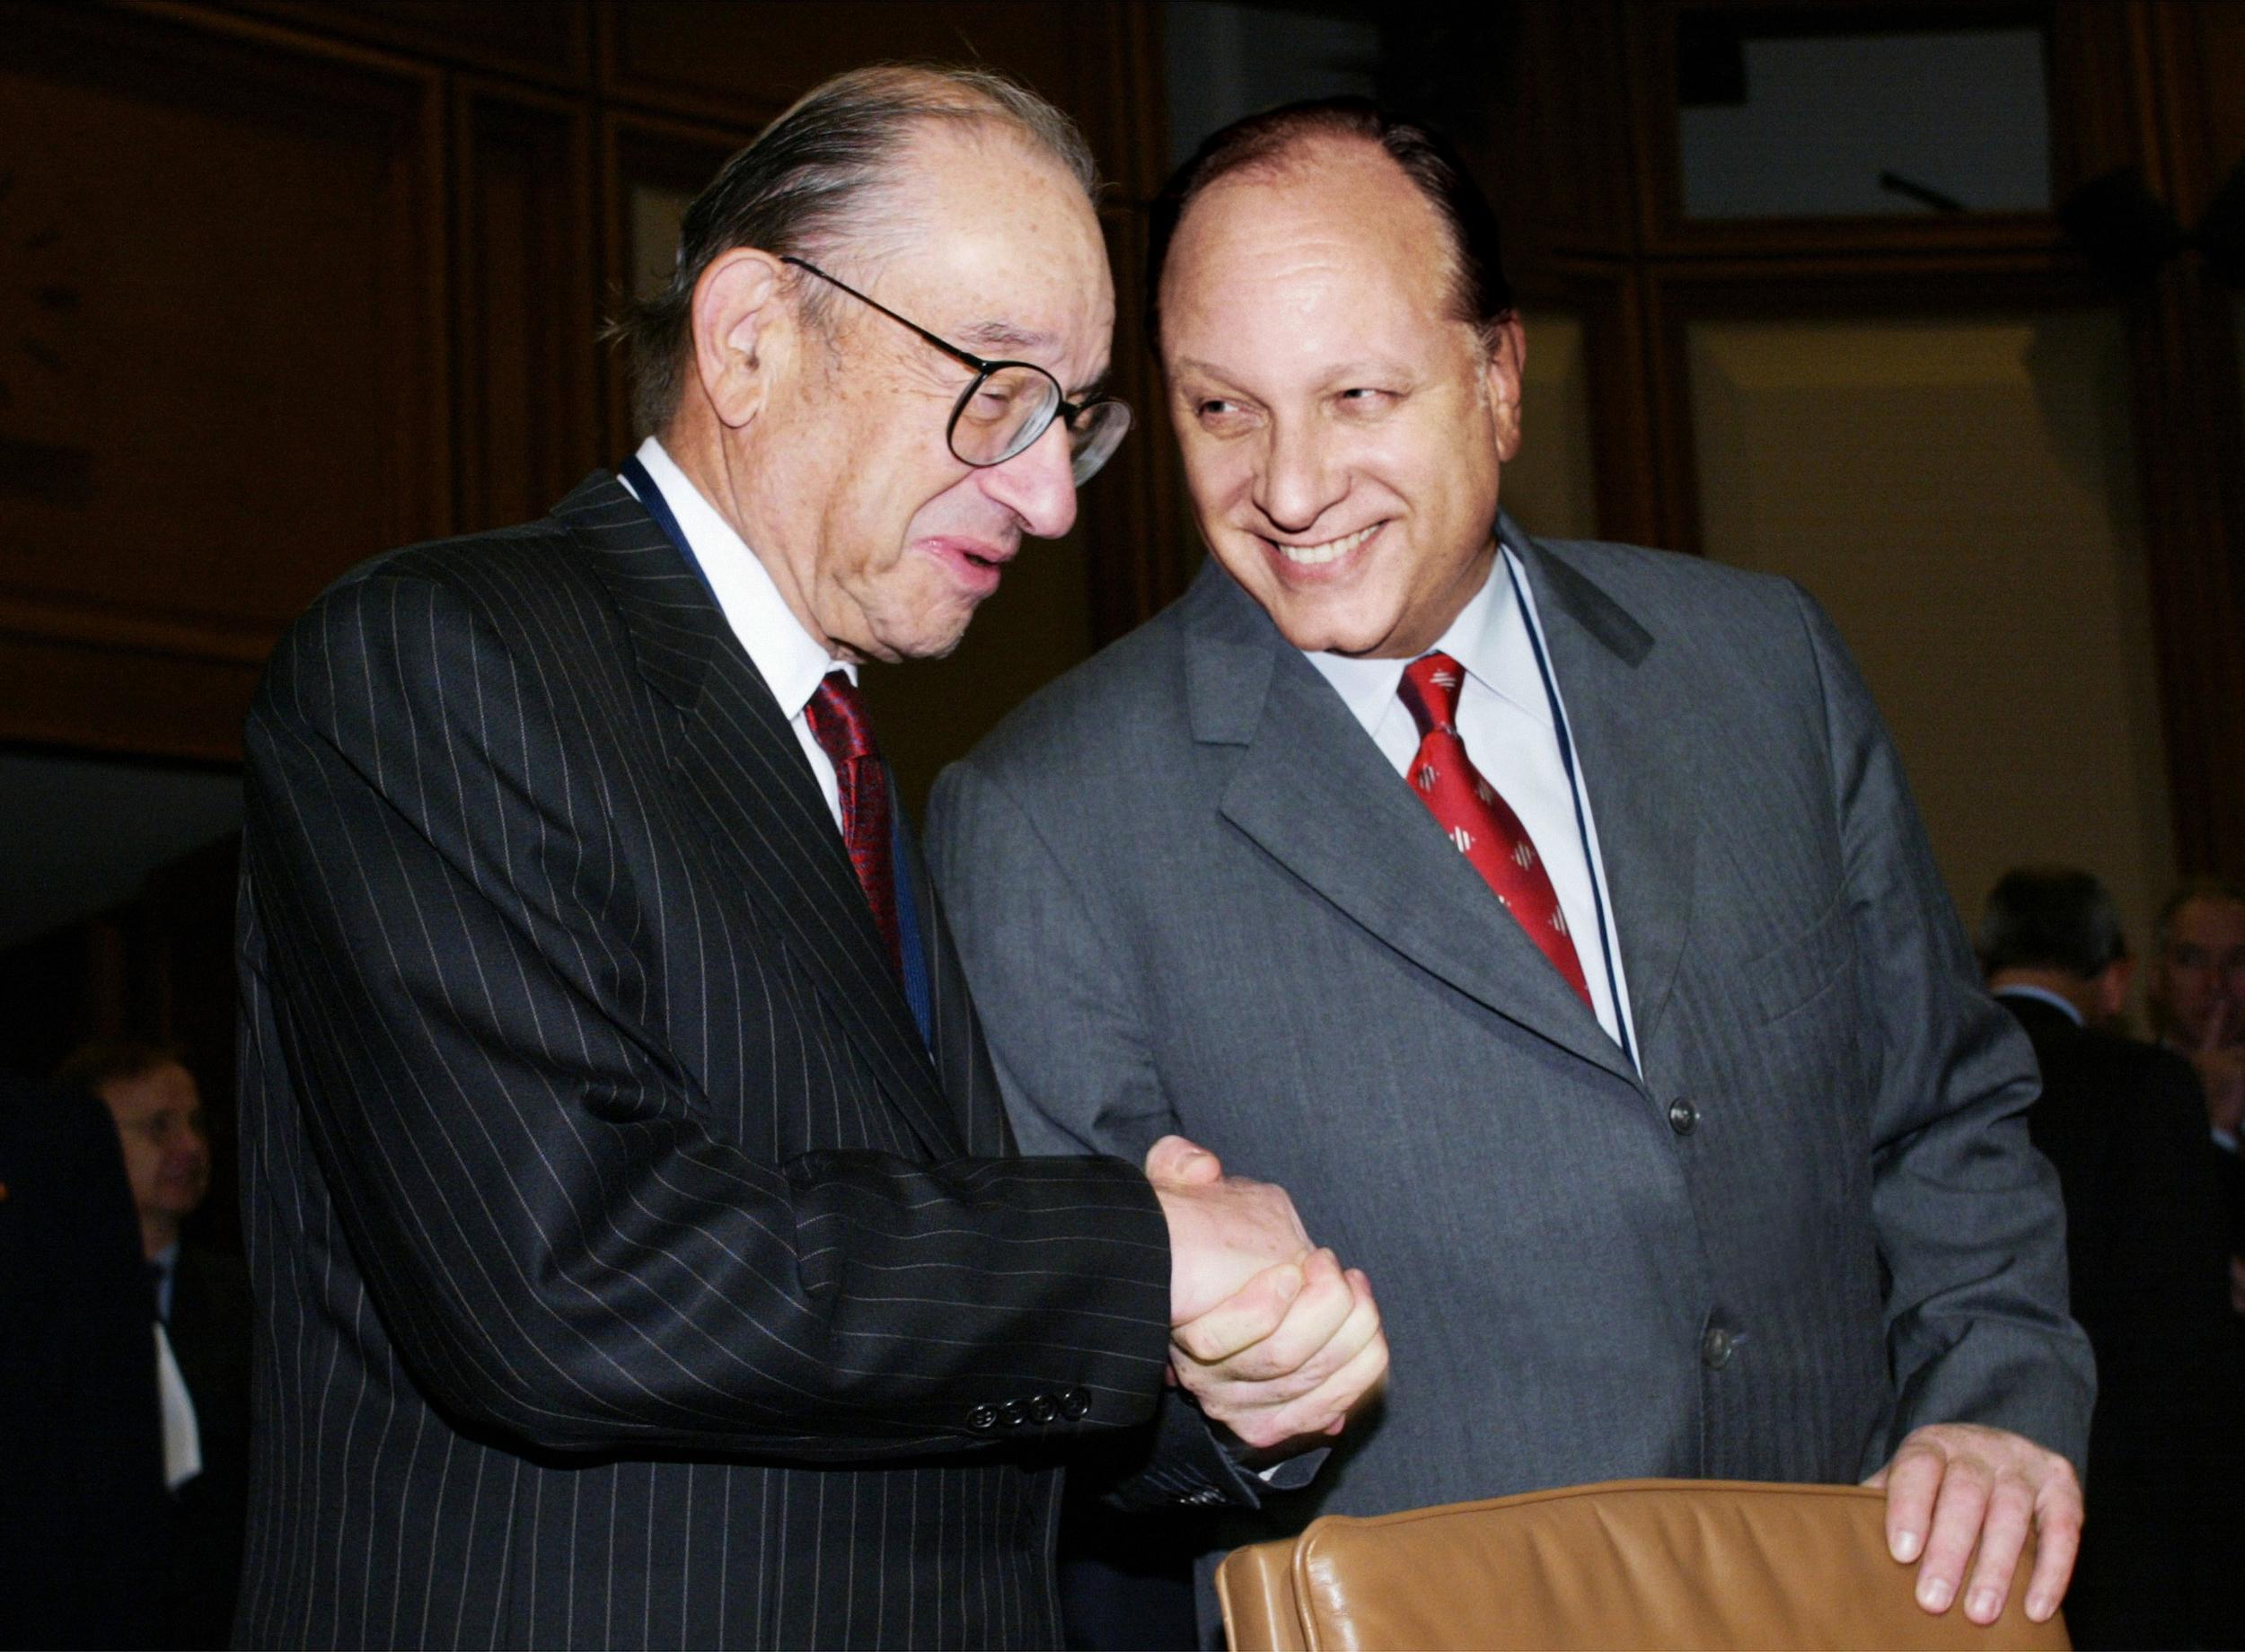 Greenspan Photoshop 1.jpg